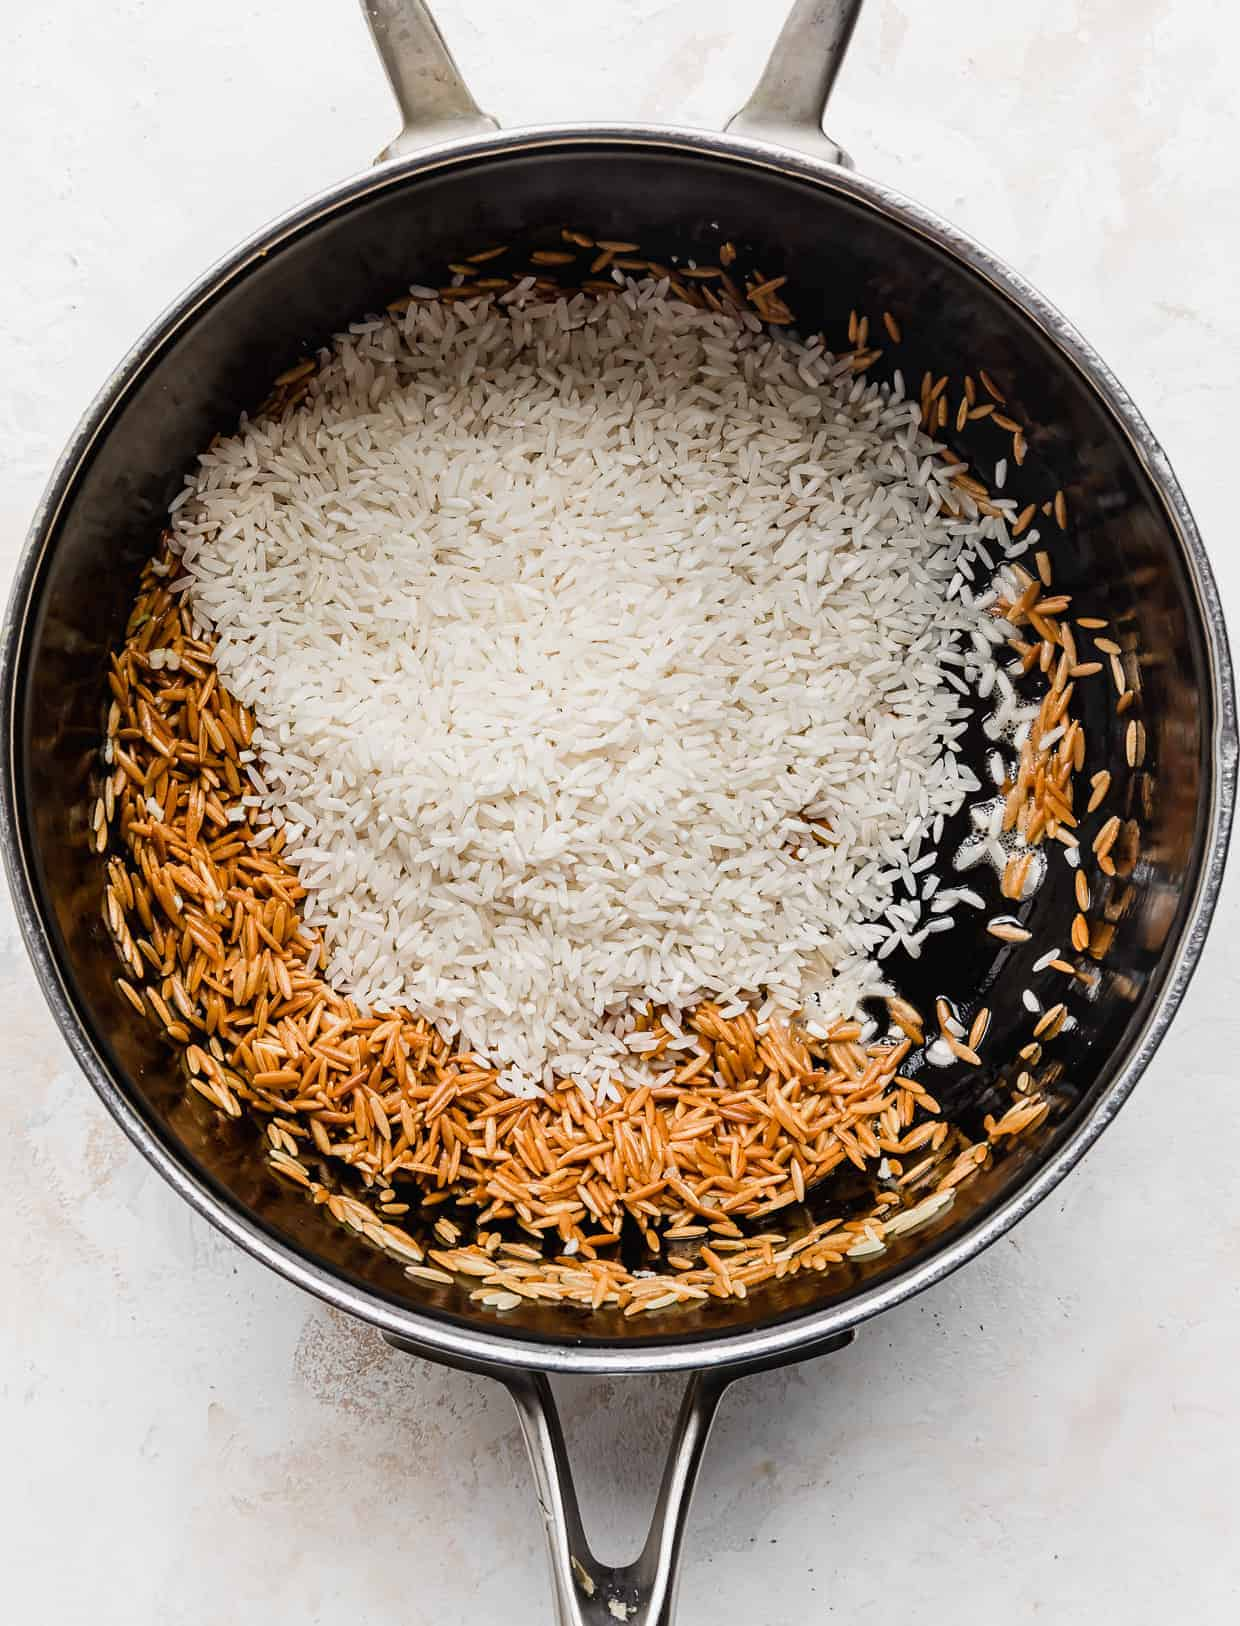 White rice in a saucepan, overtop of golden brown orzo pasta.